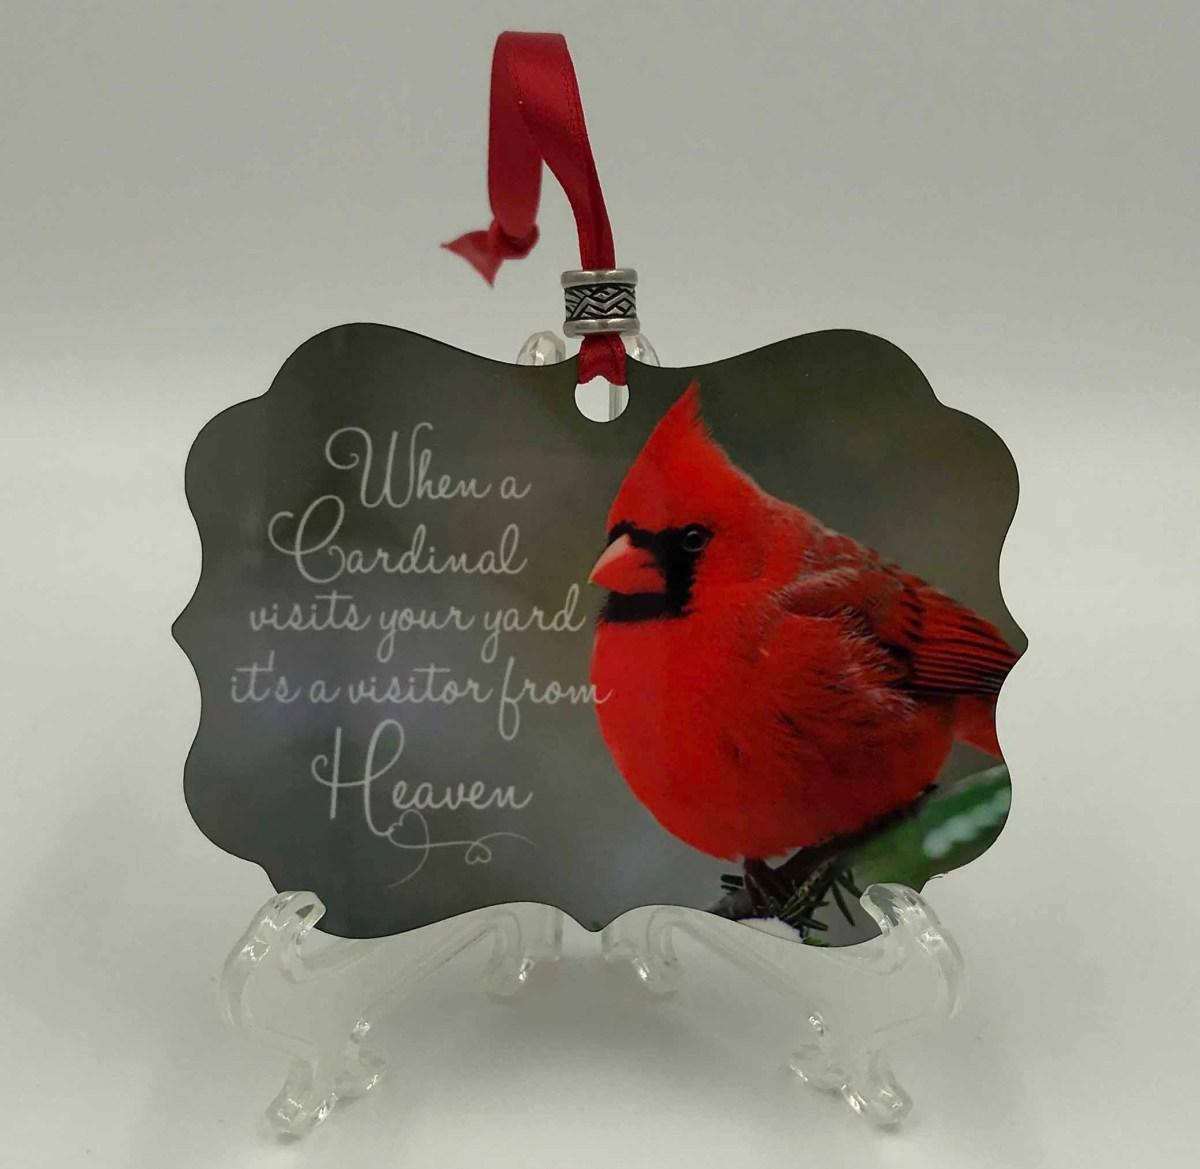 Benelux Cardinal Ornament